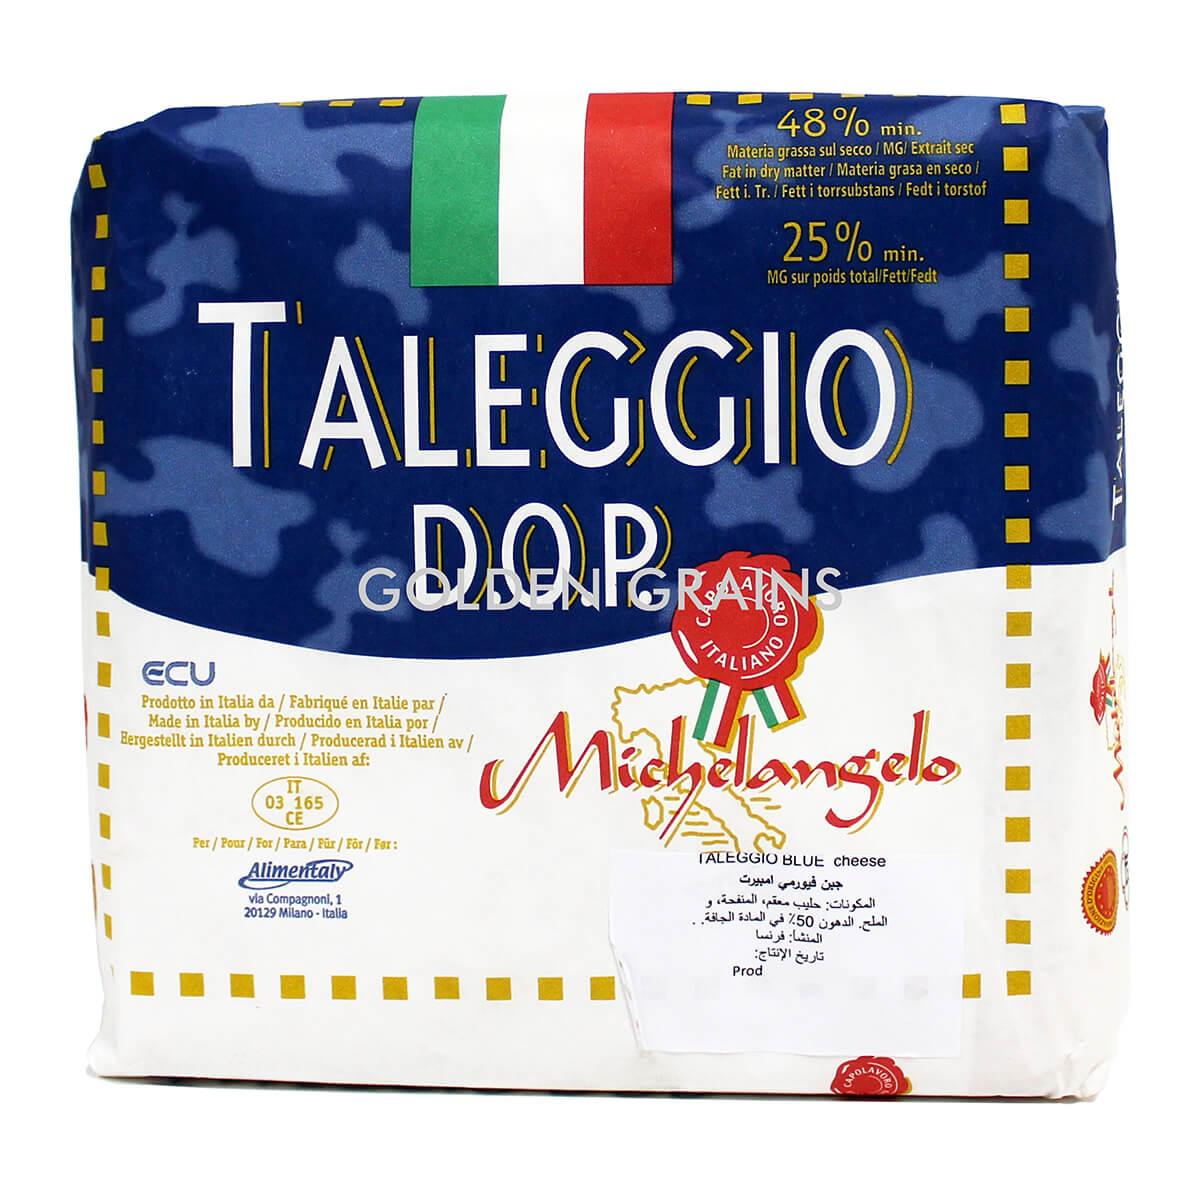 Michelangelo Talegio